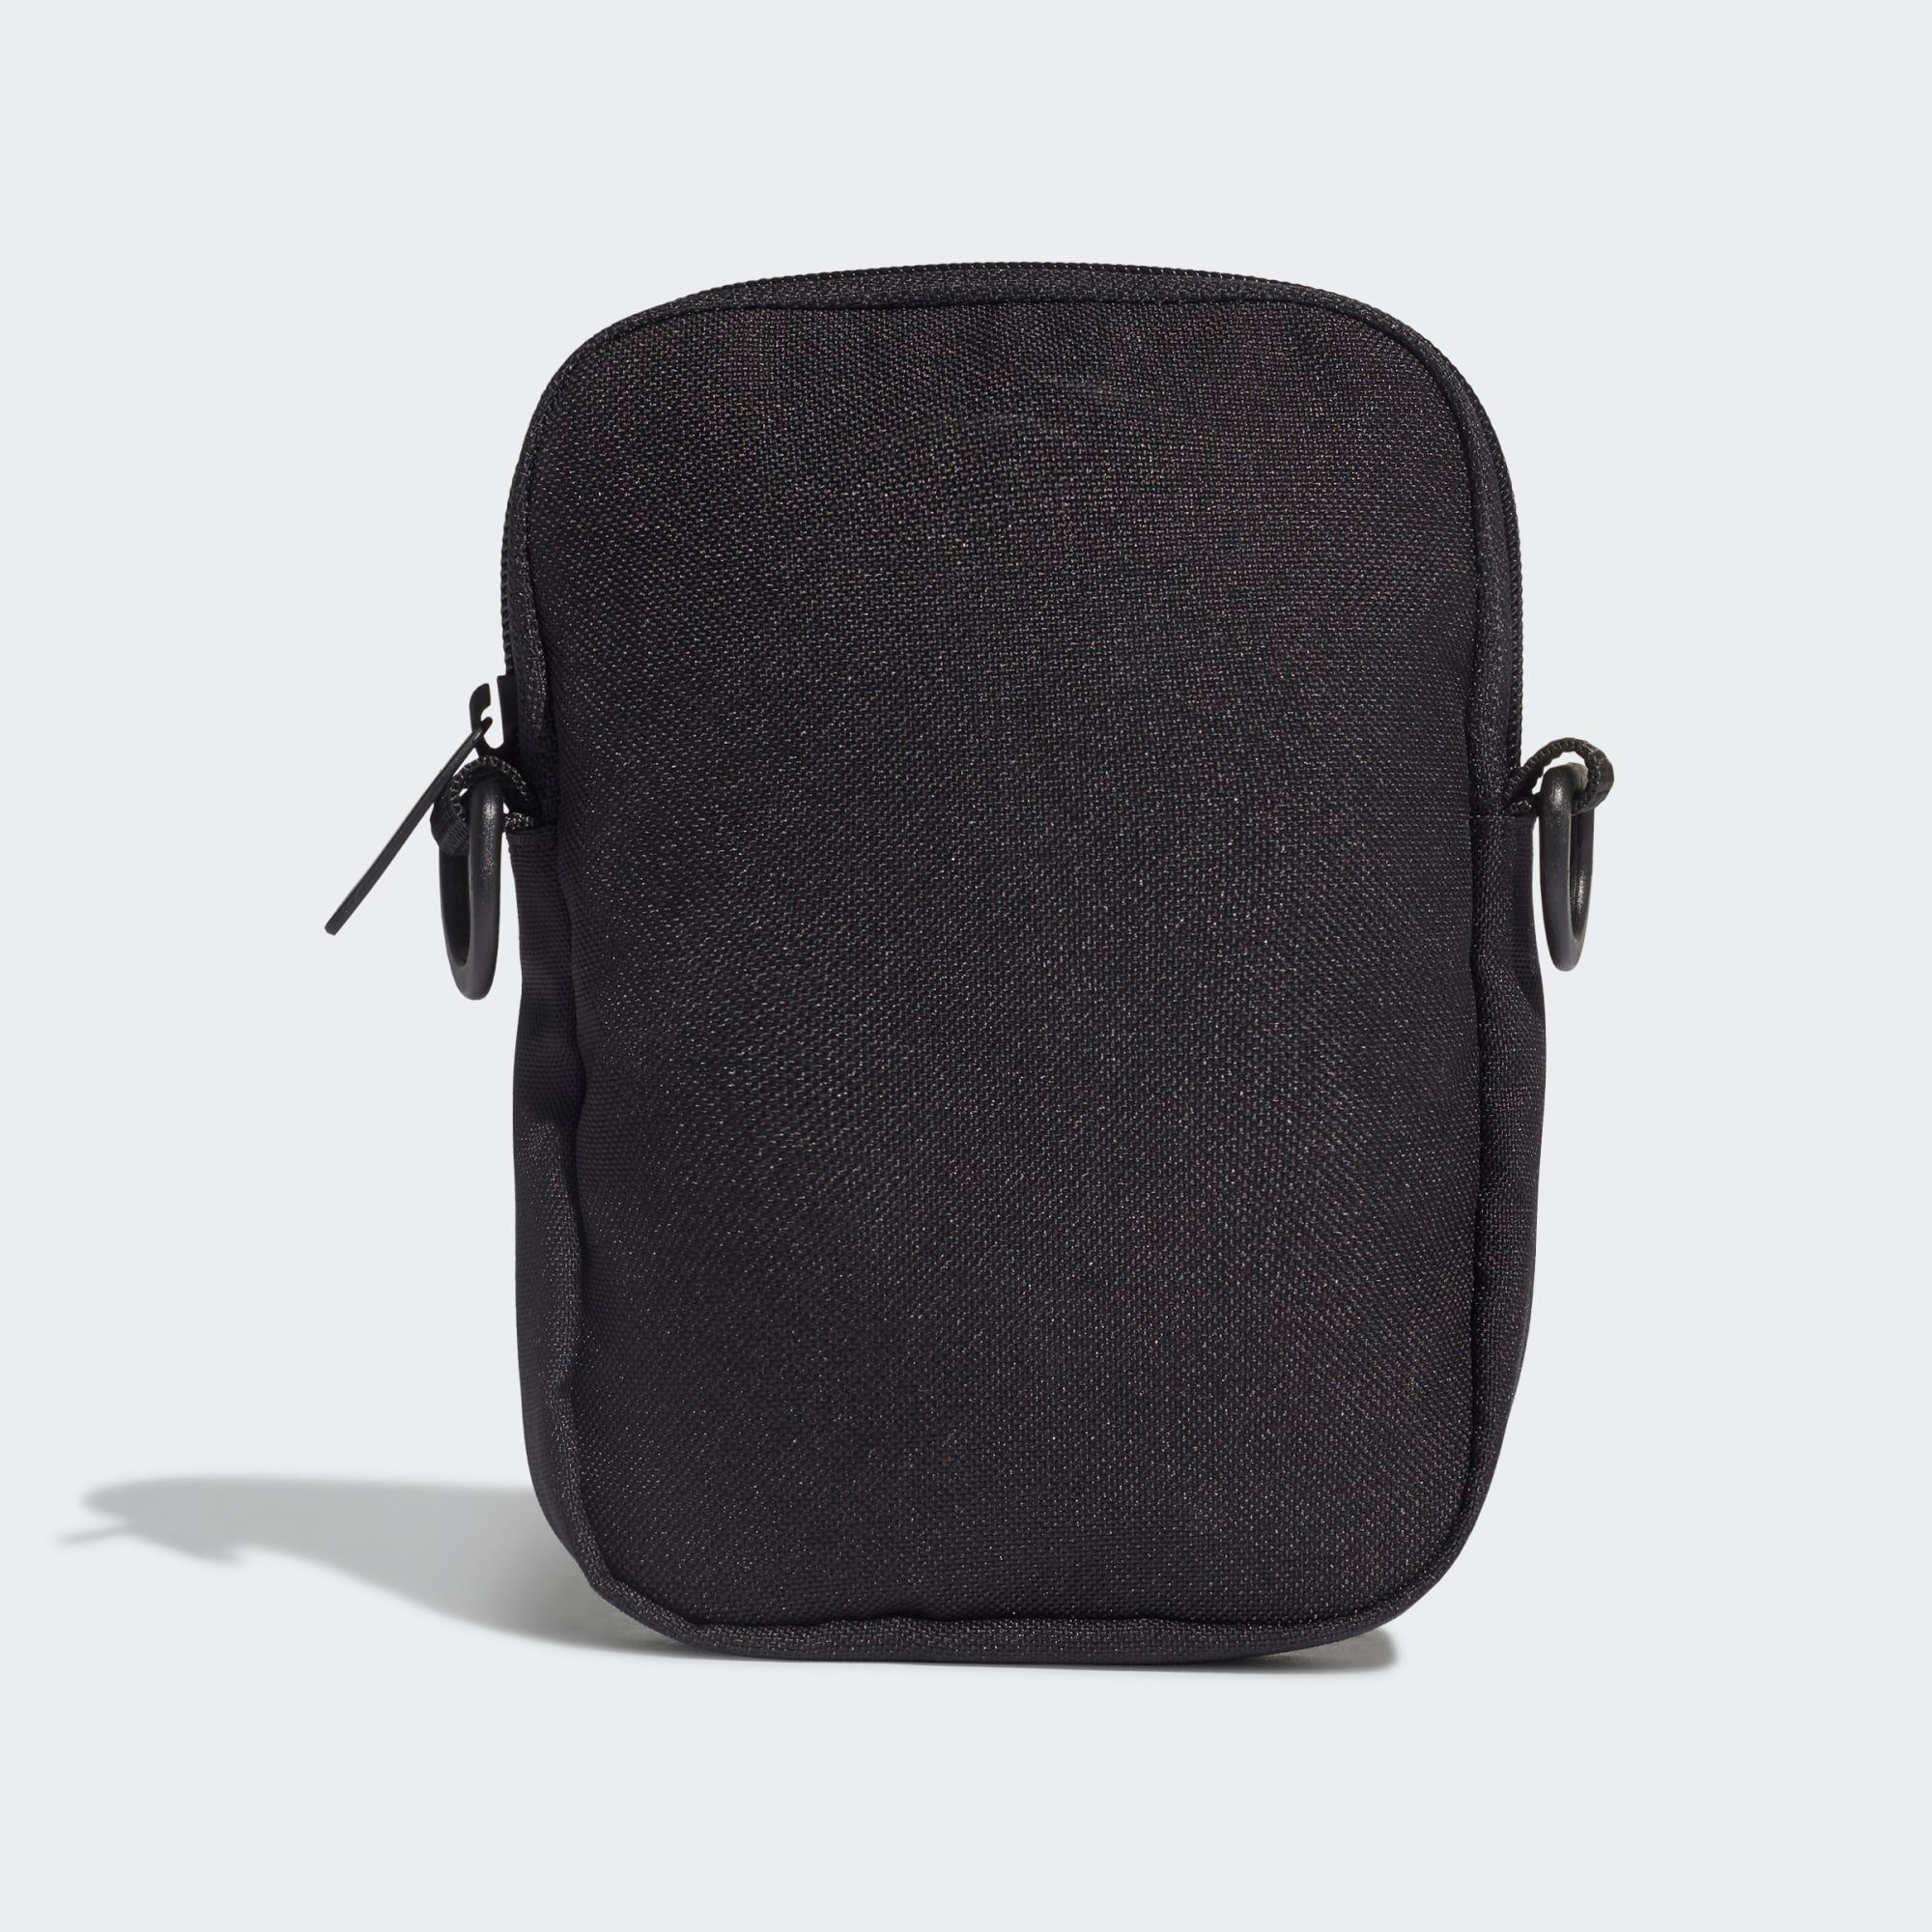 adidas Originals Schultertasche »Adicolor Large Trefoil Festival Tasche«, adicolor online kaufen | OTTO